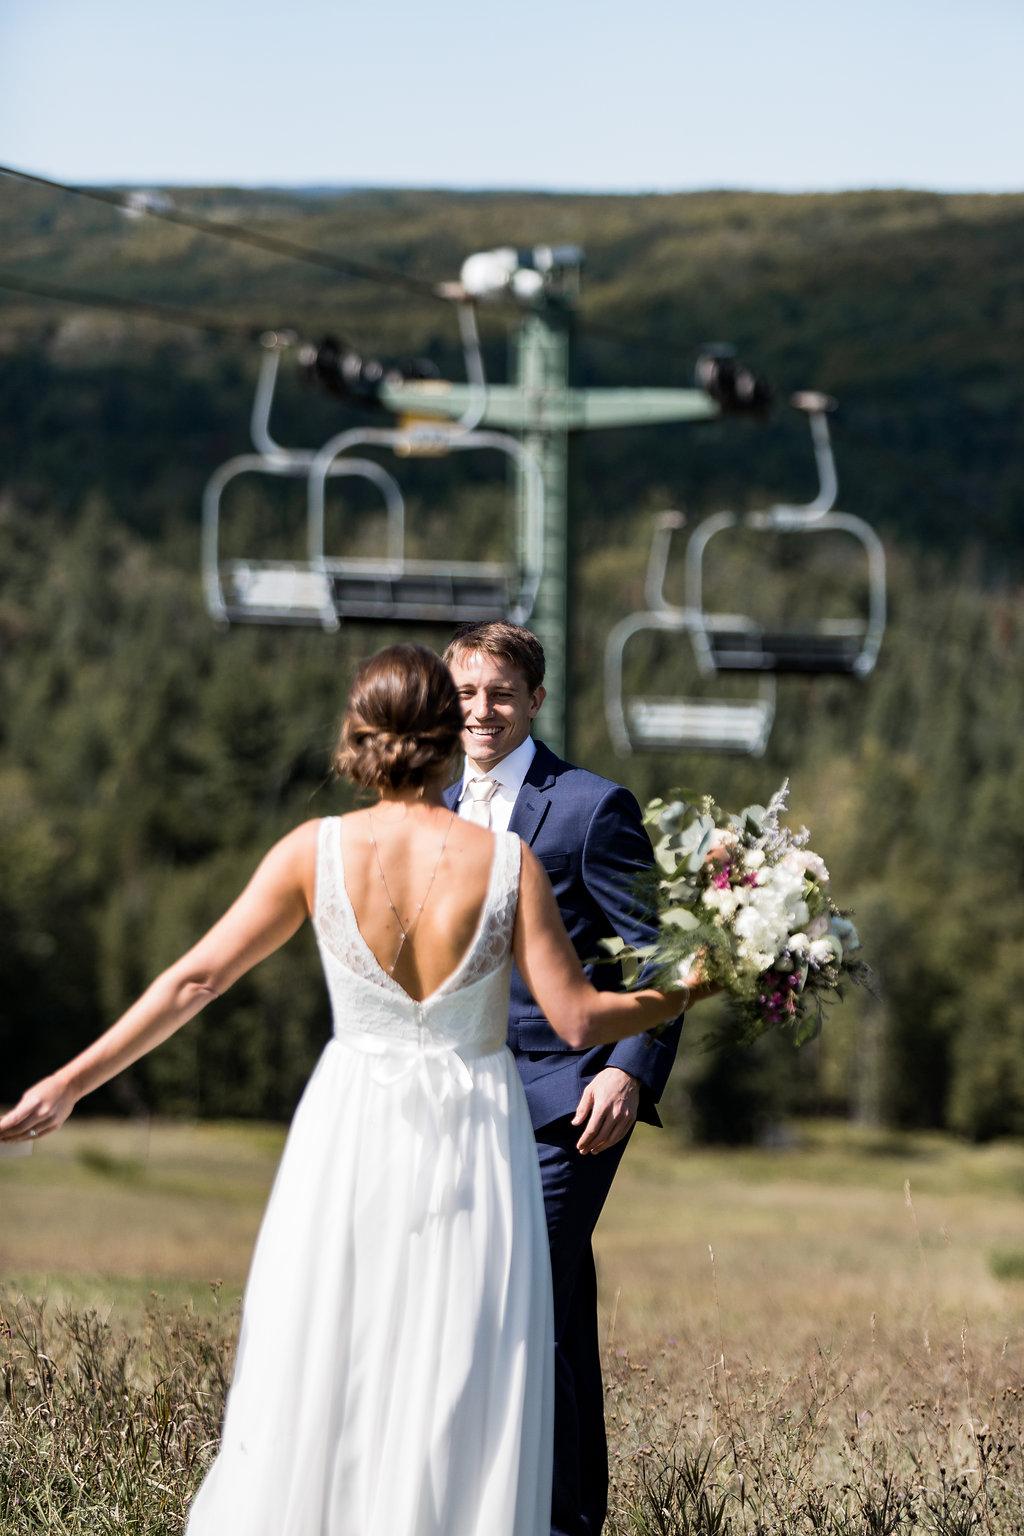 Sonshine_barn_northern_michigan_wedding_-35.jpg